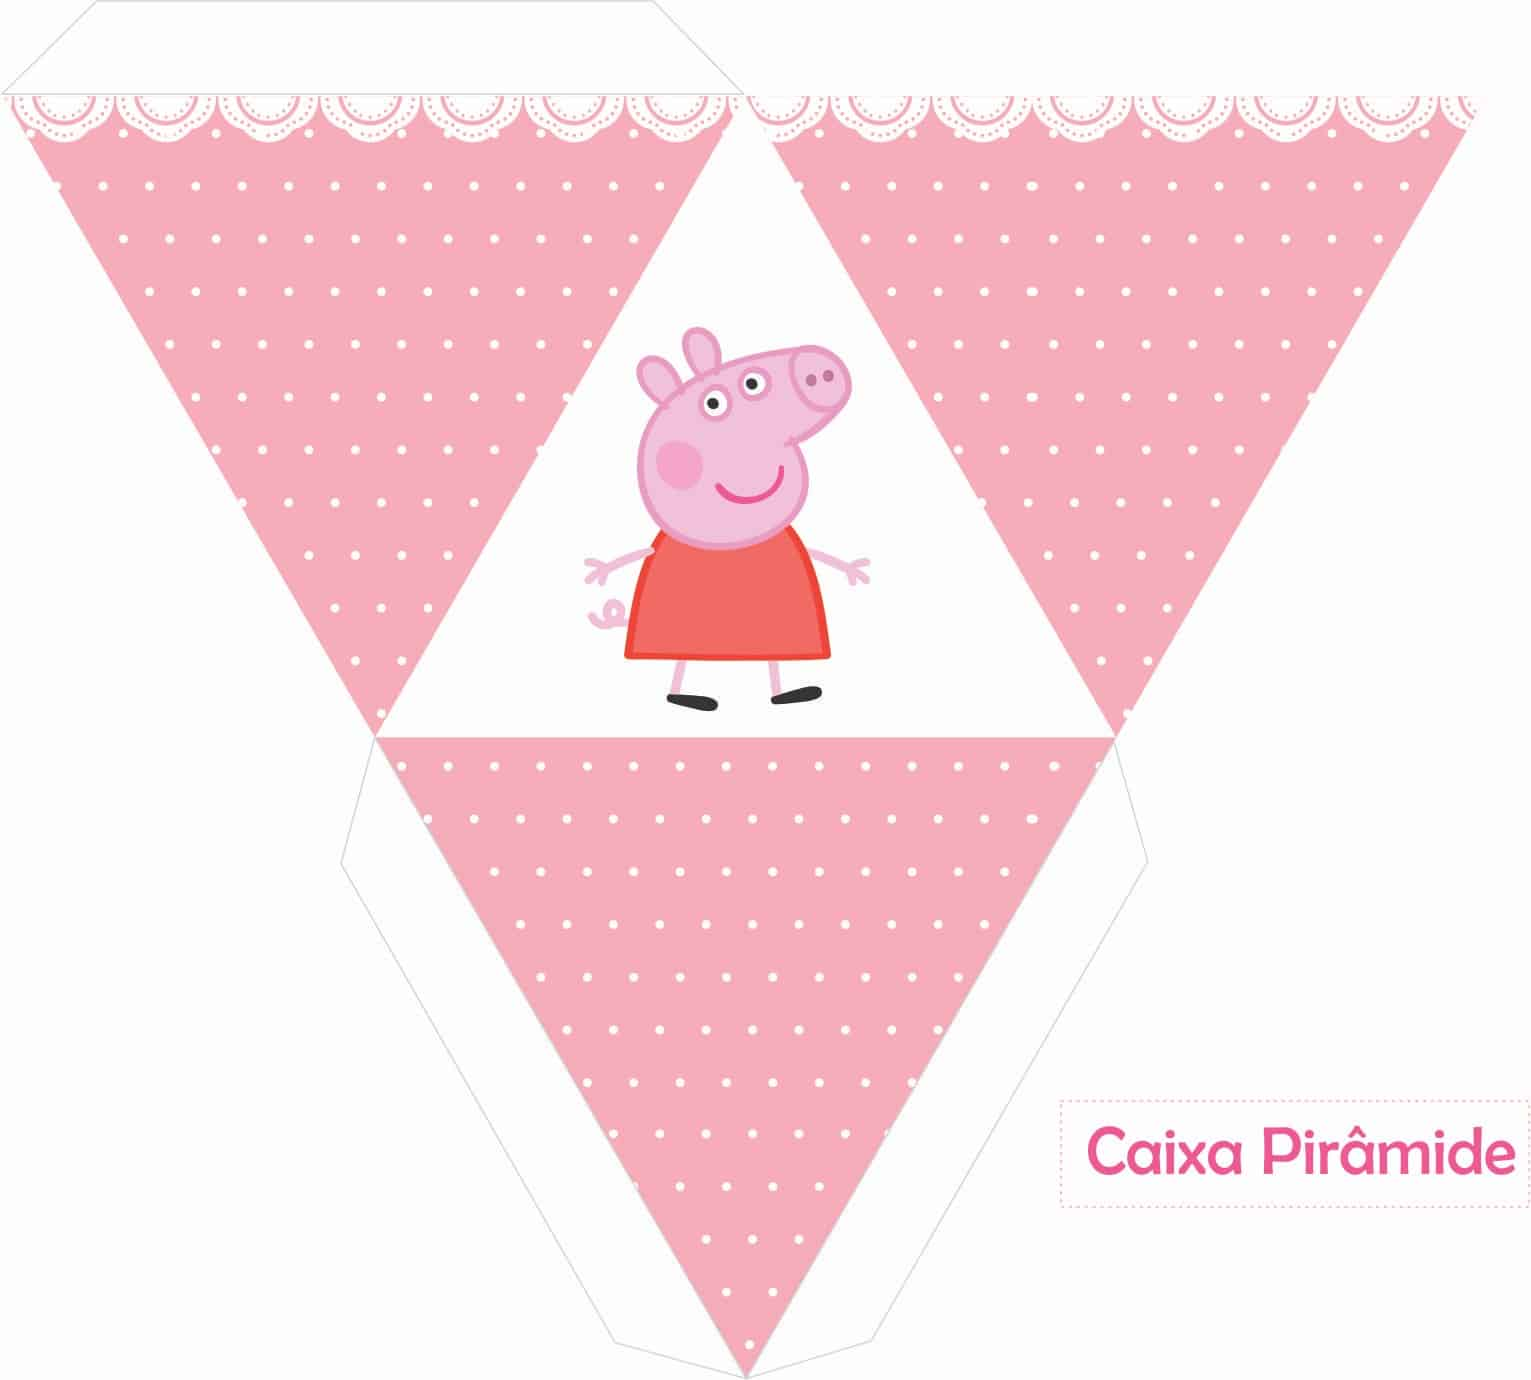 caixa piramide peppa